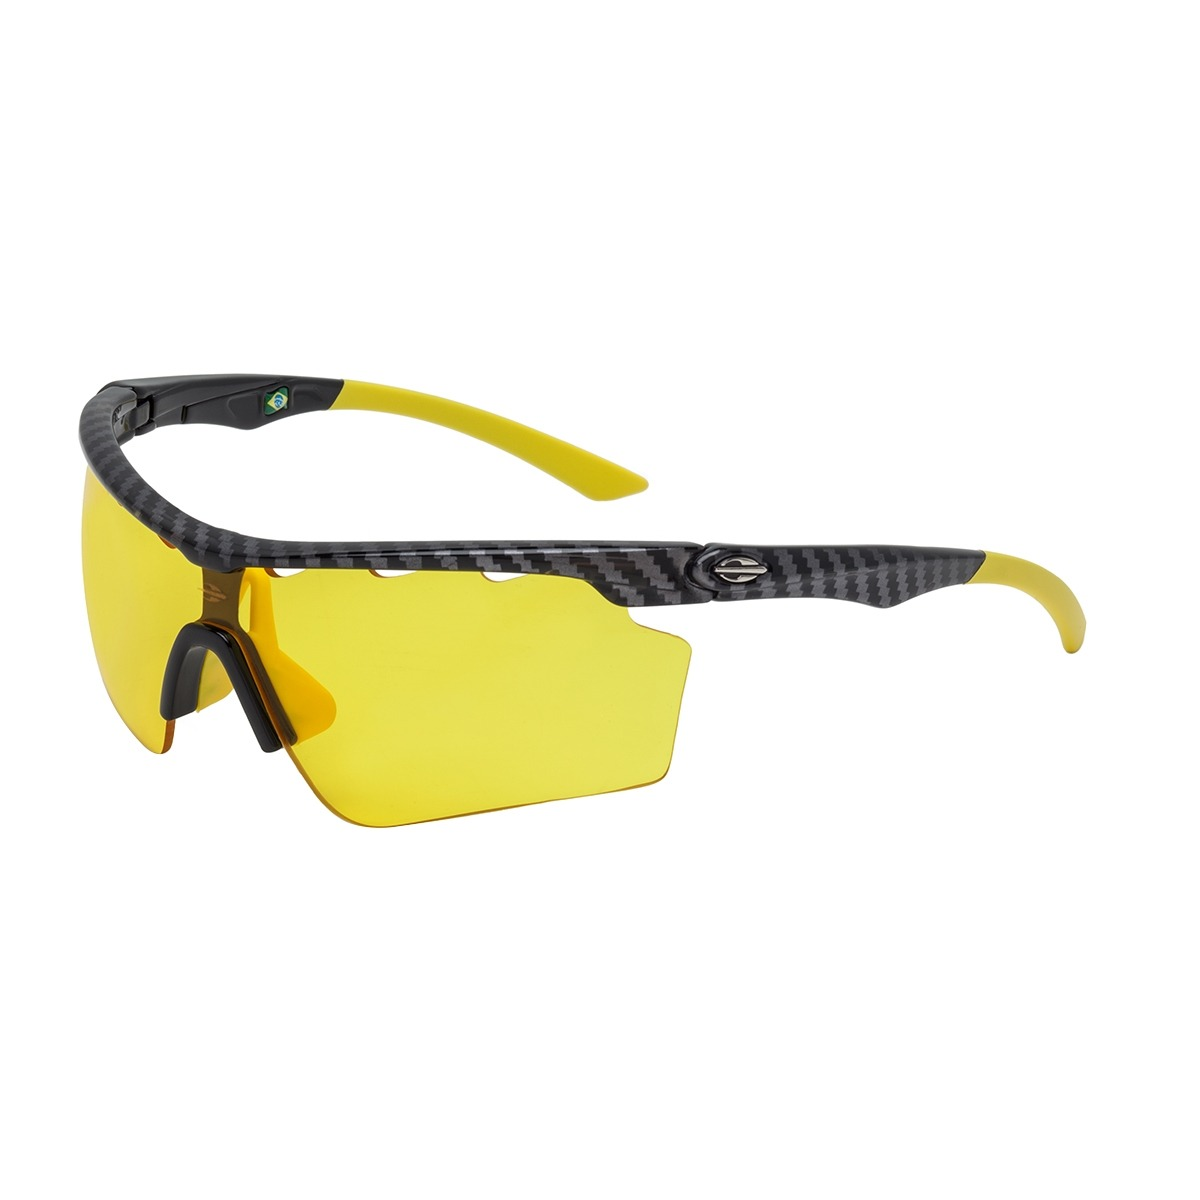 9246aafa0da41 Óculos De Sol Mormaii Athlon V Preto Carbono E Lente Amarela - R ...